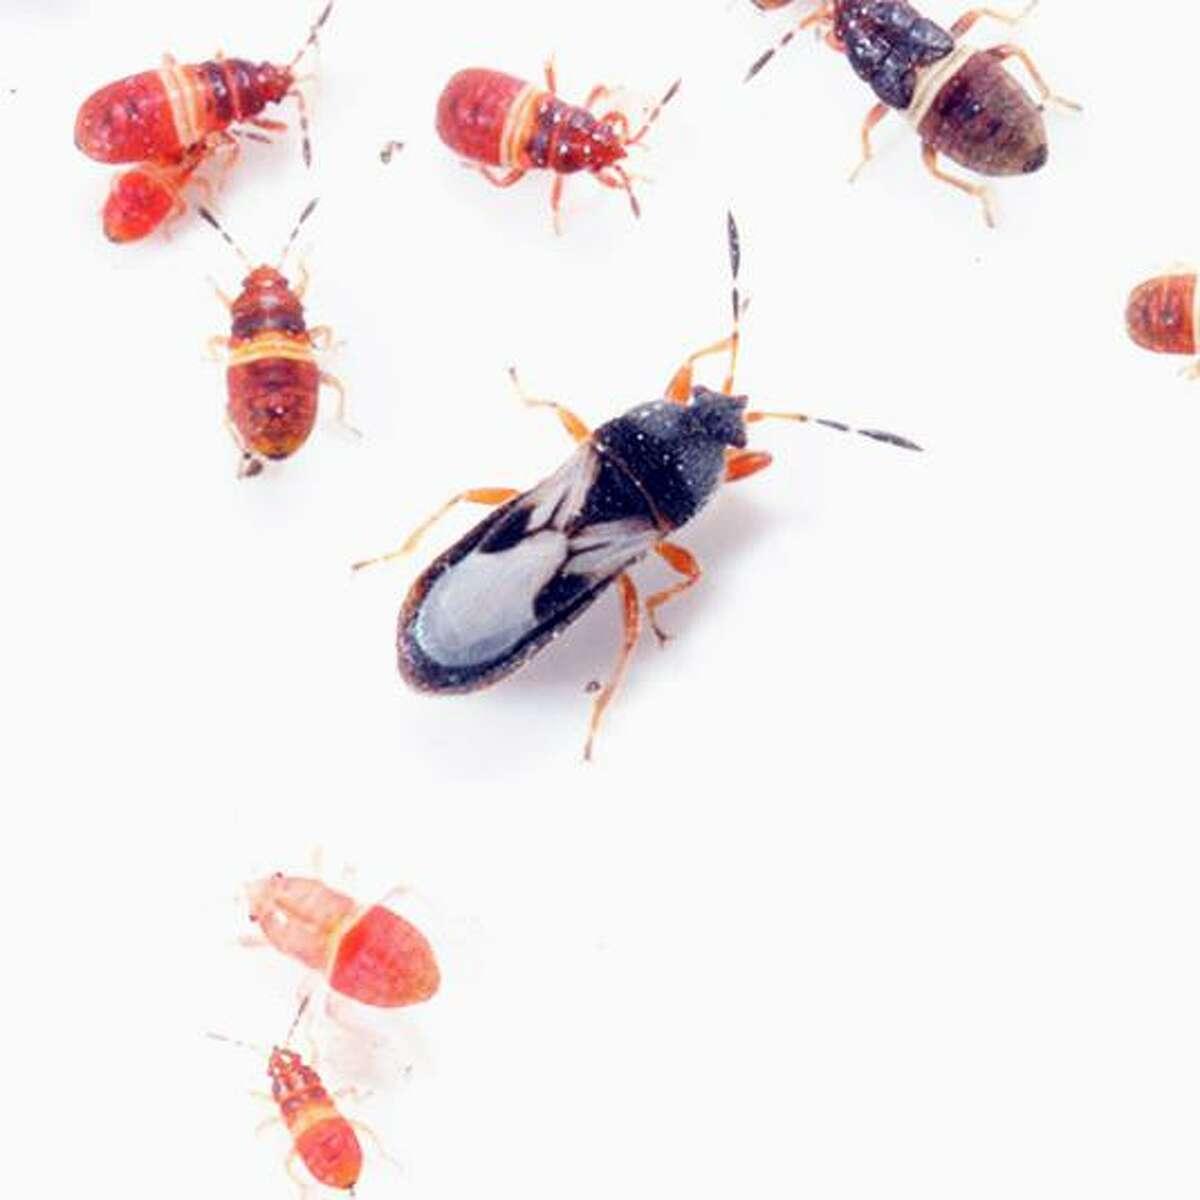 Chinch bugs